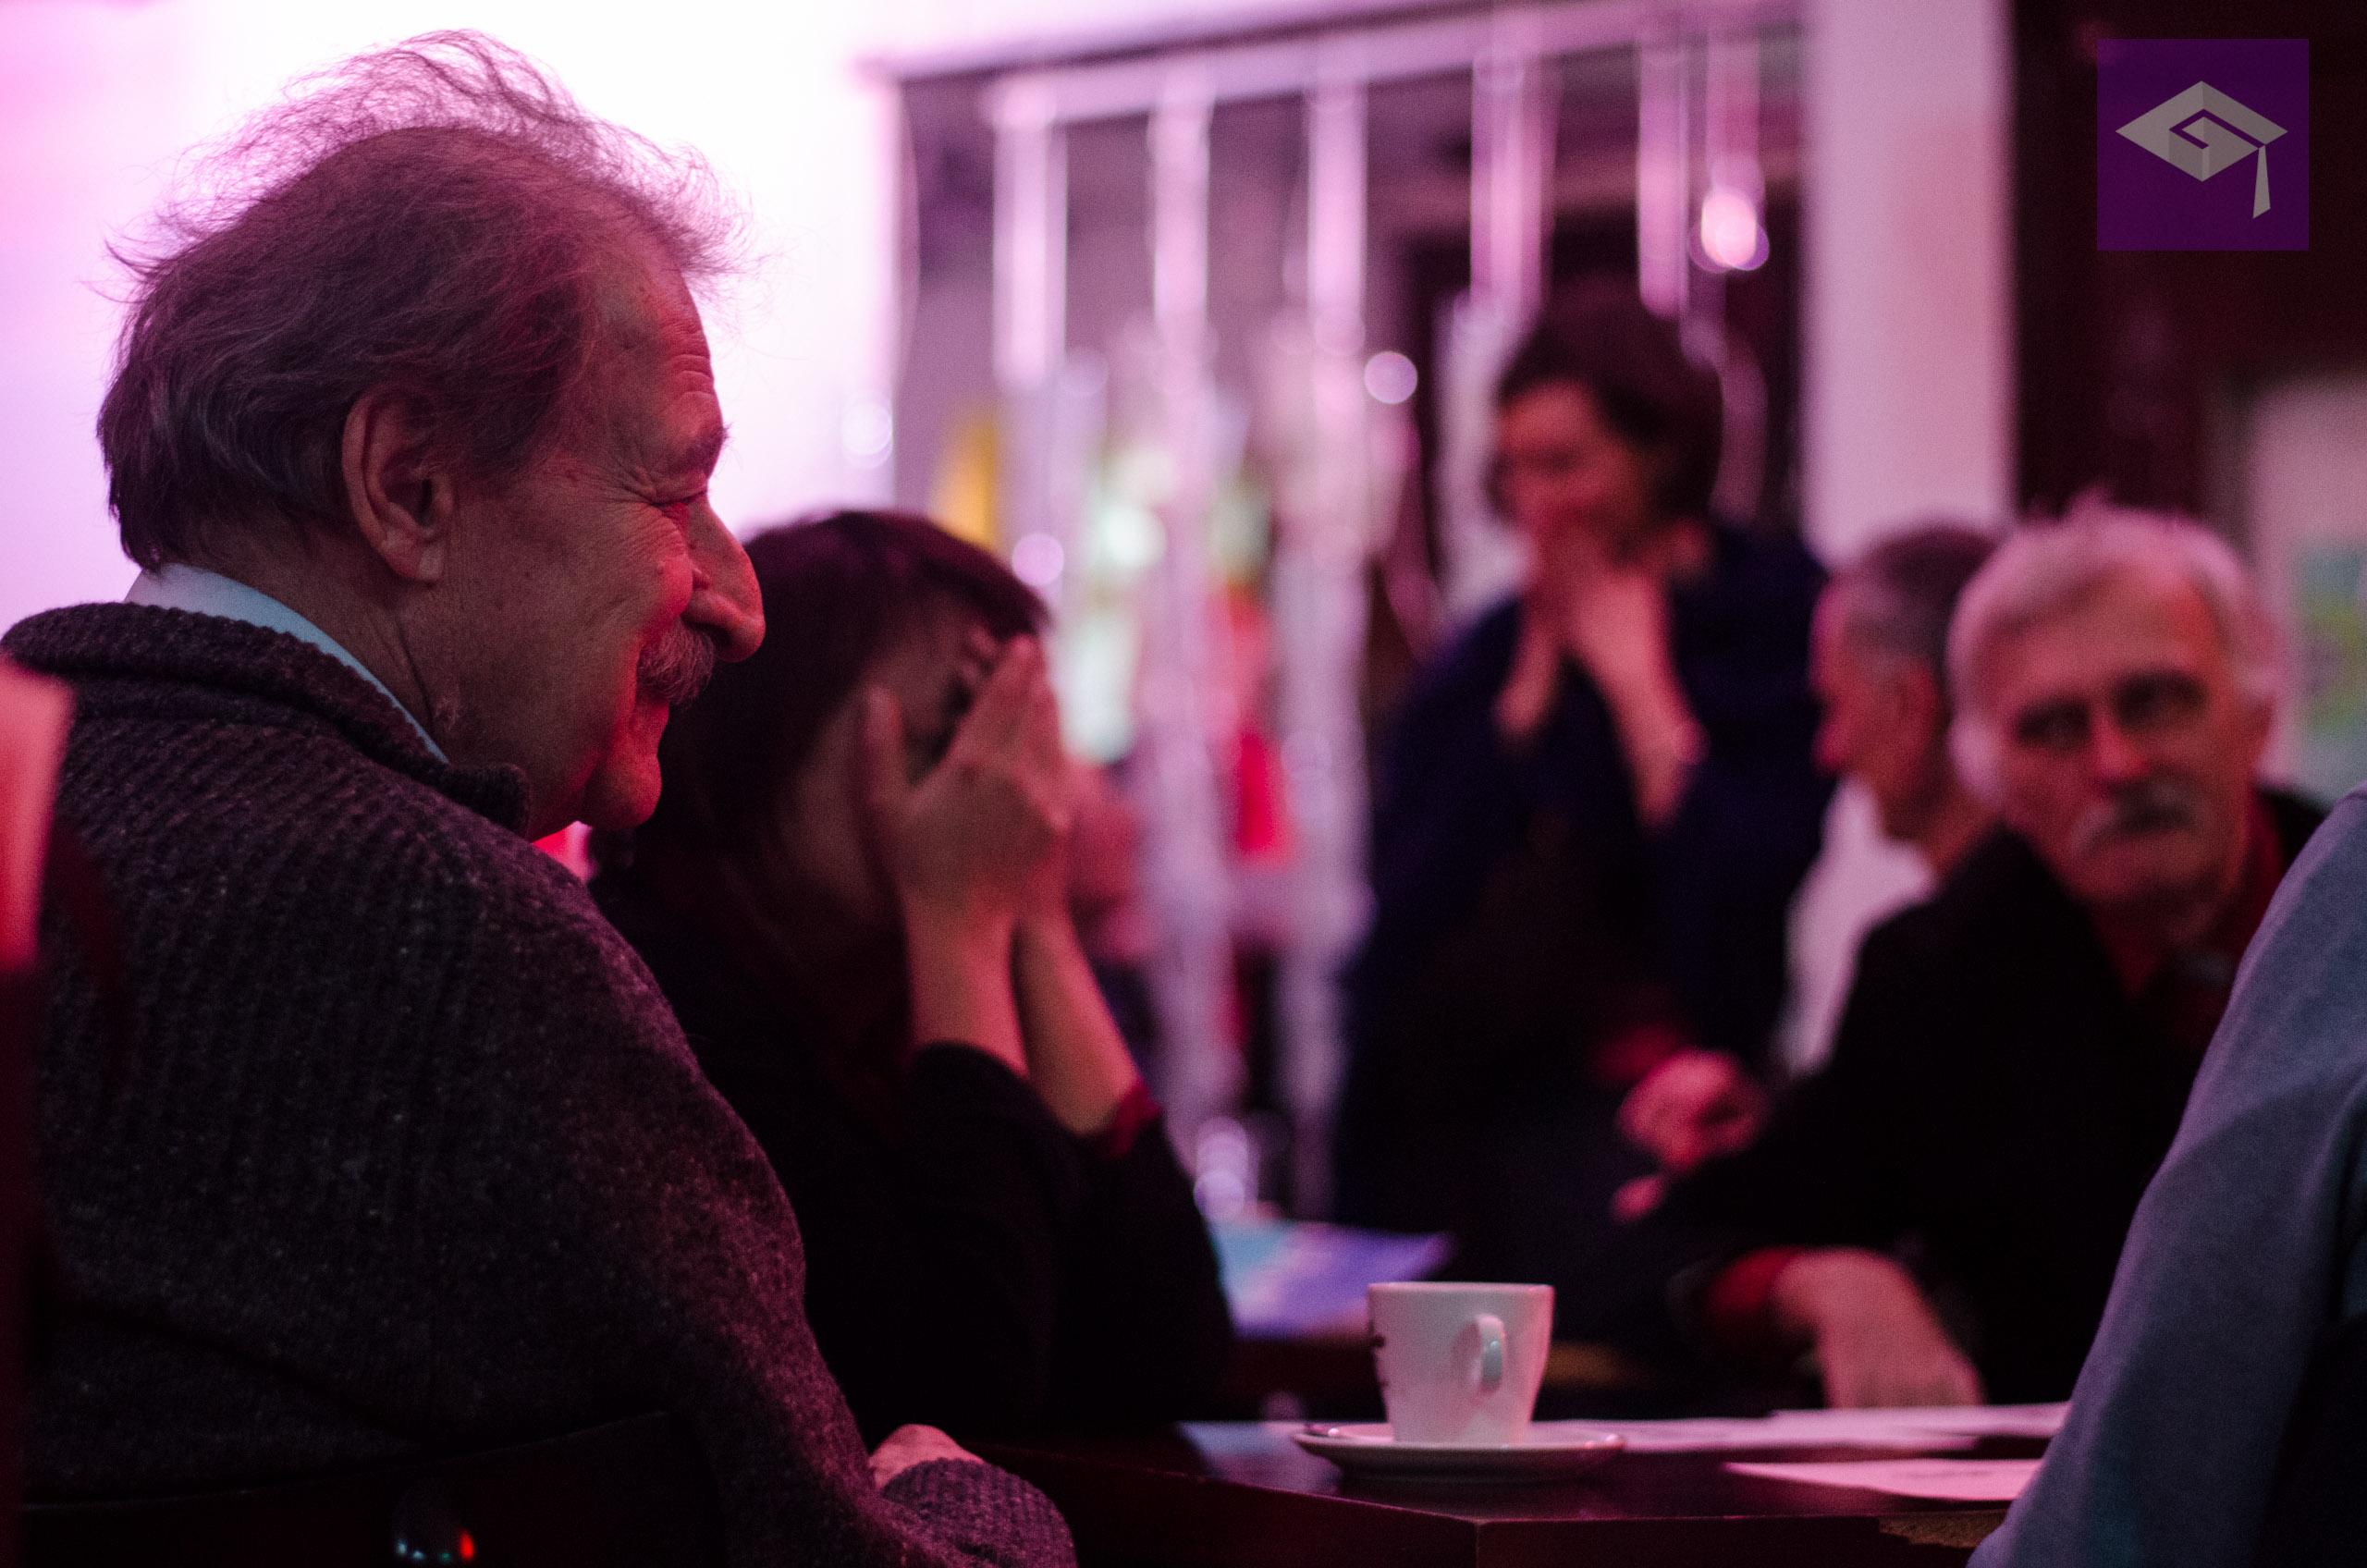 Spisovateľ Tomáš Janovic ako jeden z Kaliho hostí literárneho cirkusu. foto/ Jakub Kňažko